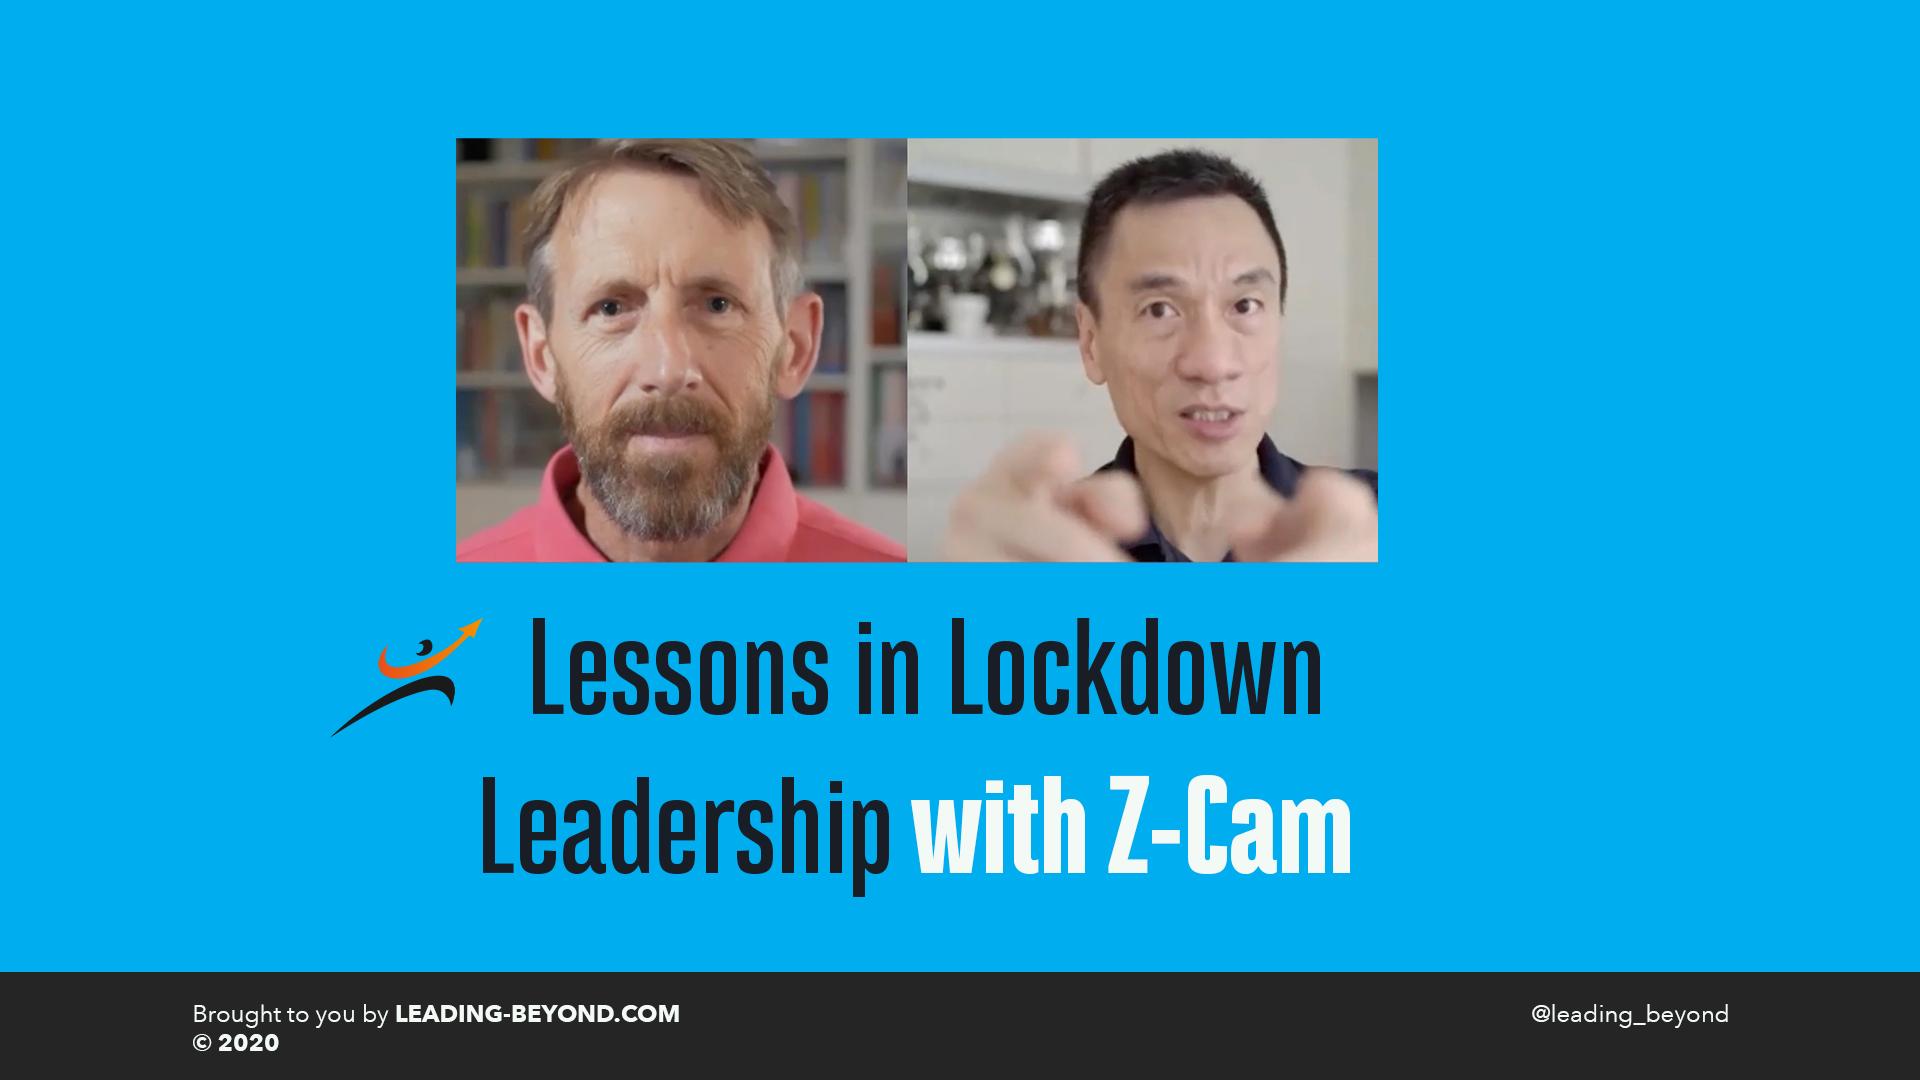 Lessons in Lockdown Leadership from Z-Cam